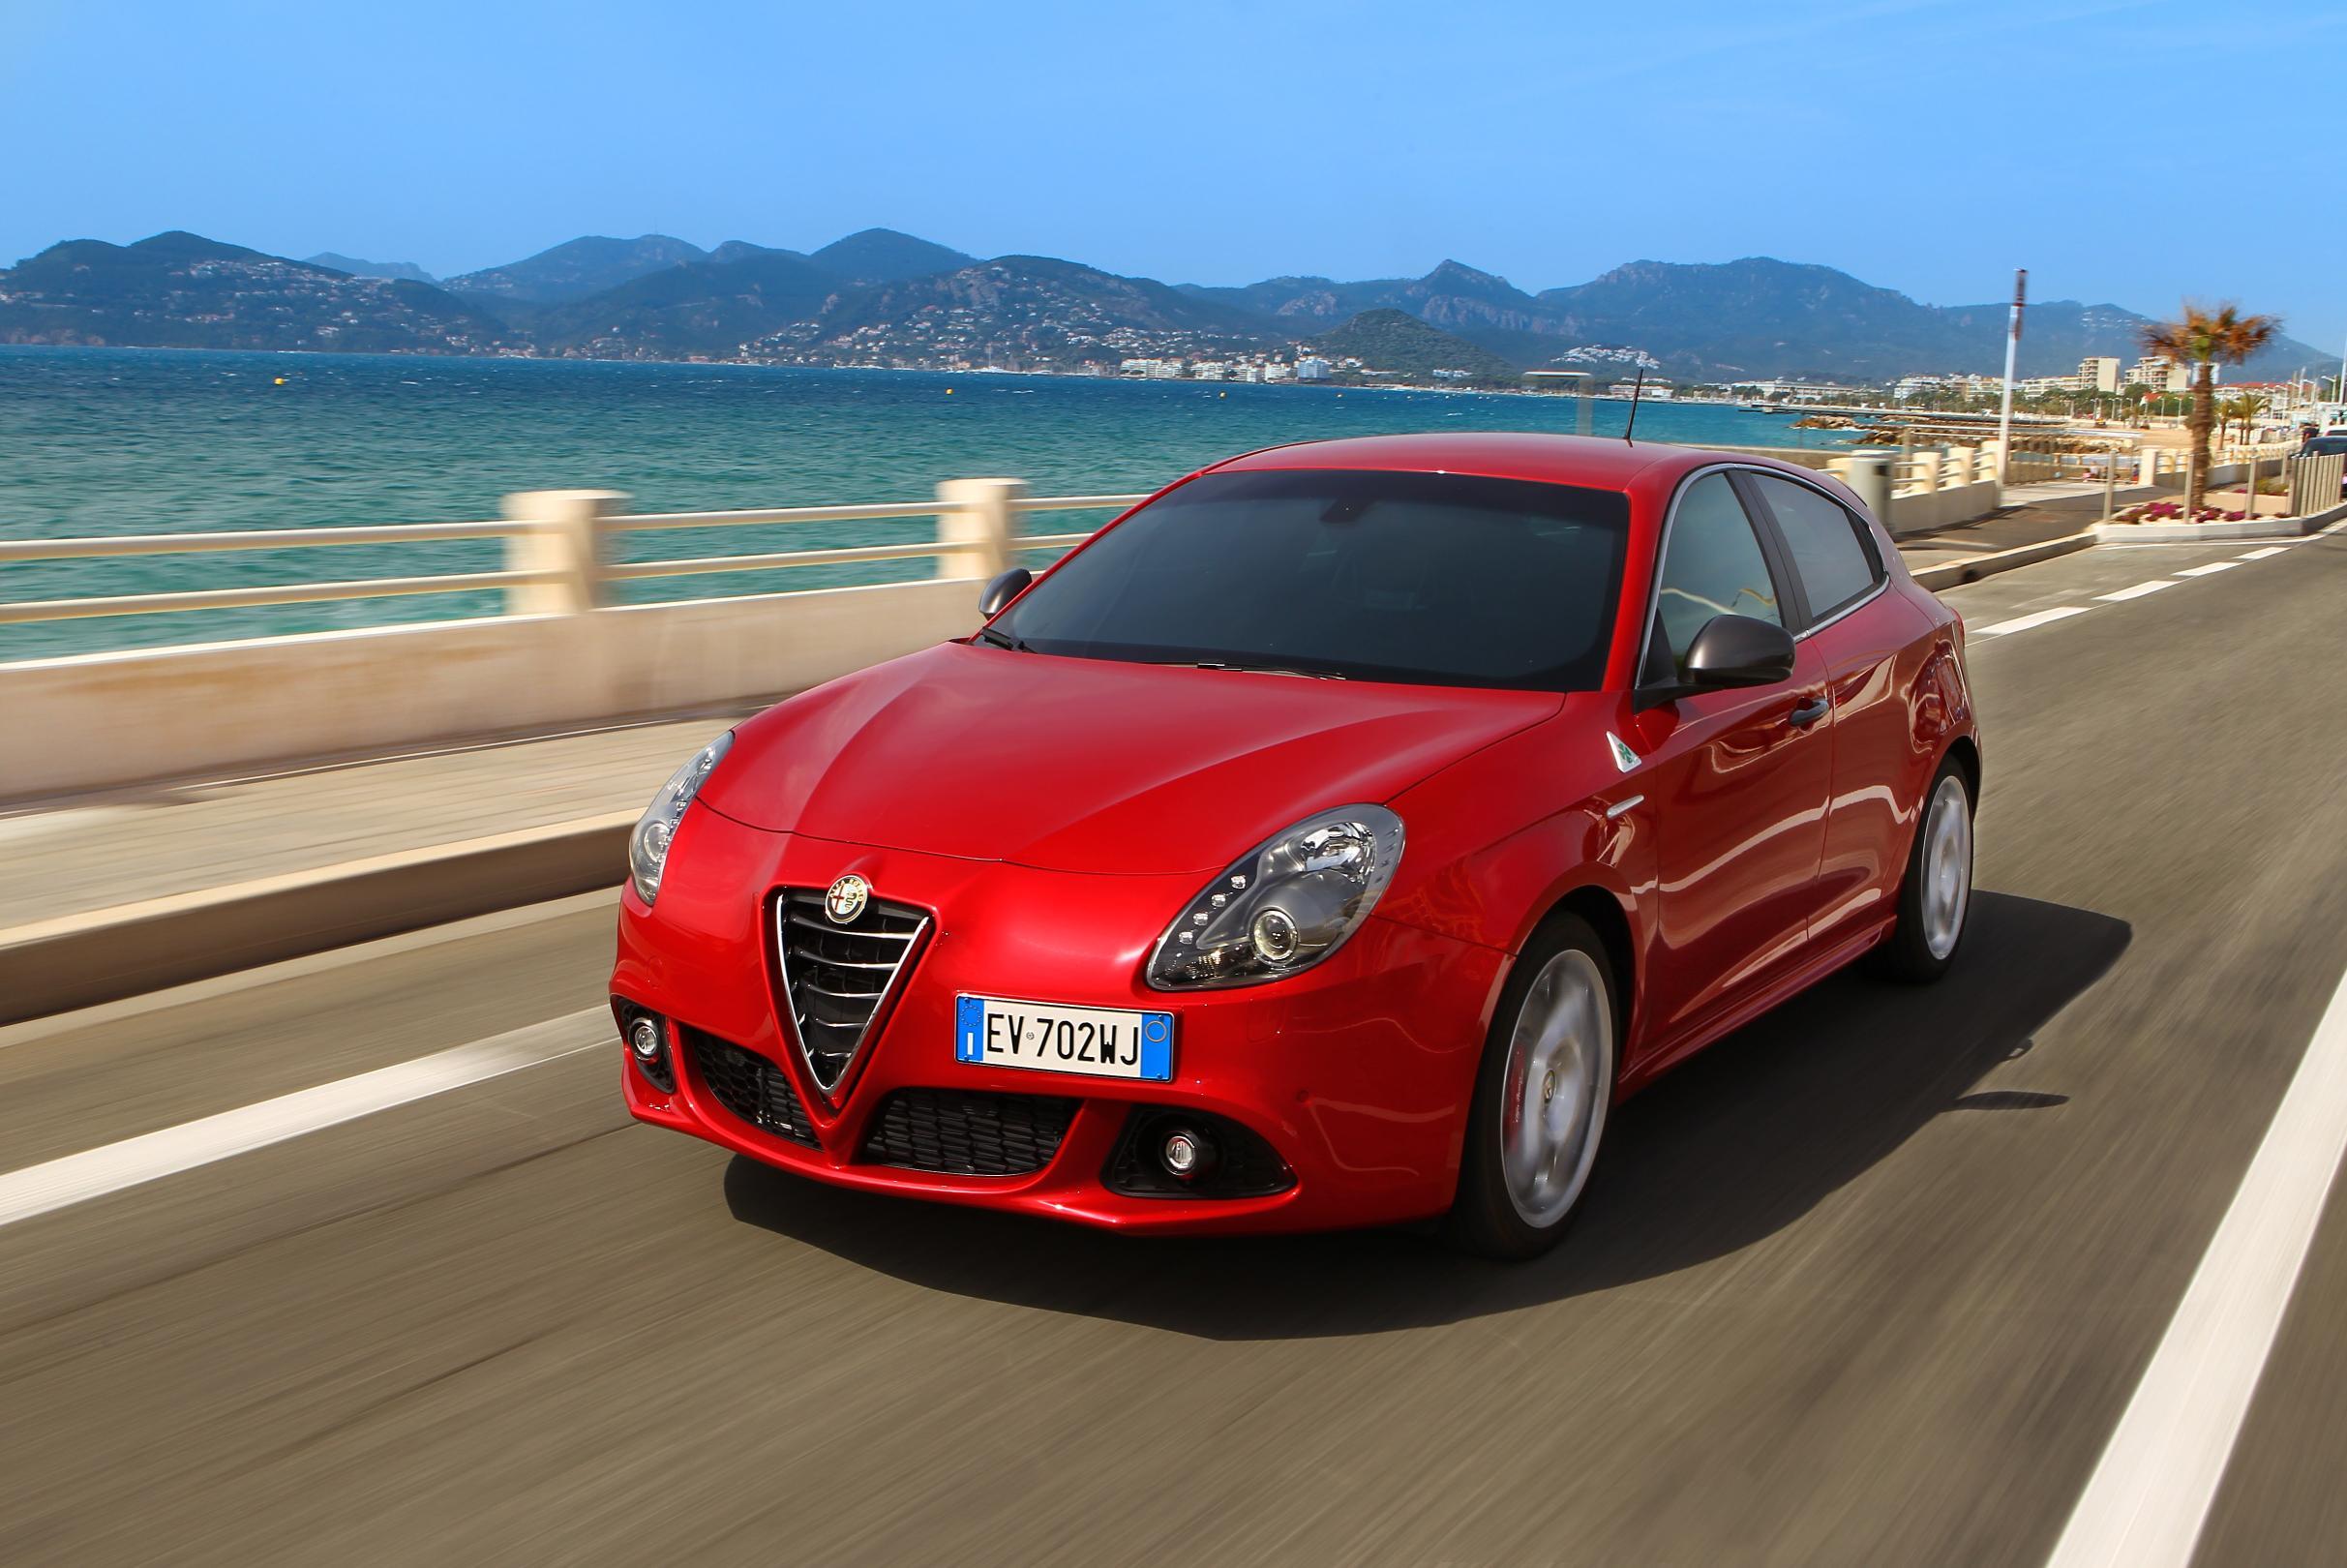 front view of 2014 Alfa Romeo Giulietta